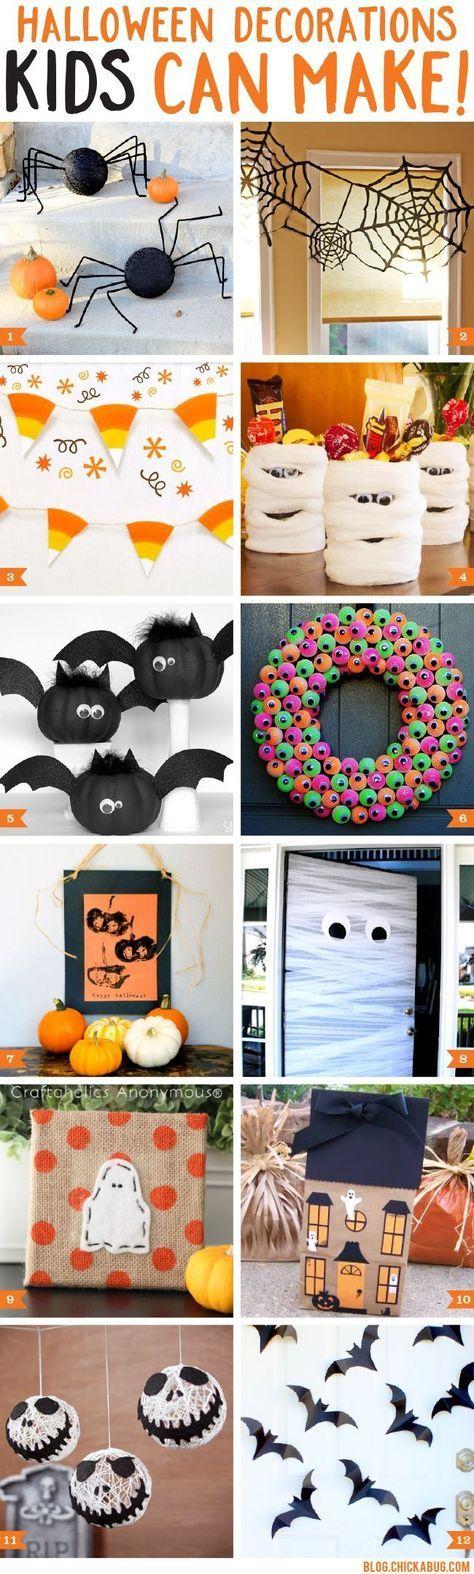 Halloween decorations kids can make Halloween ideas - what to make for halloween decorations